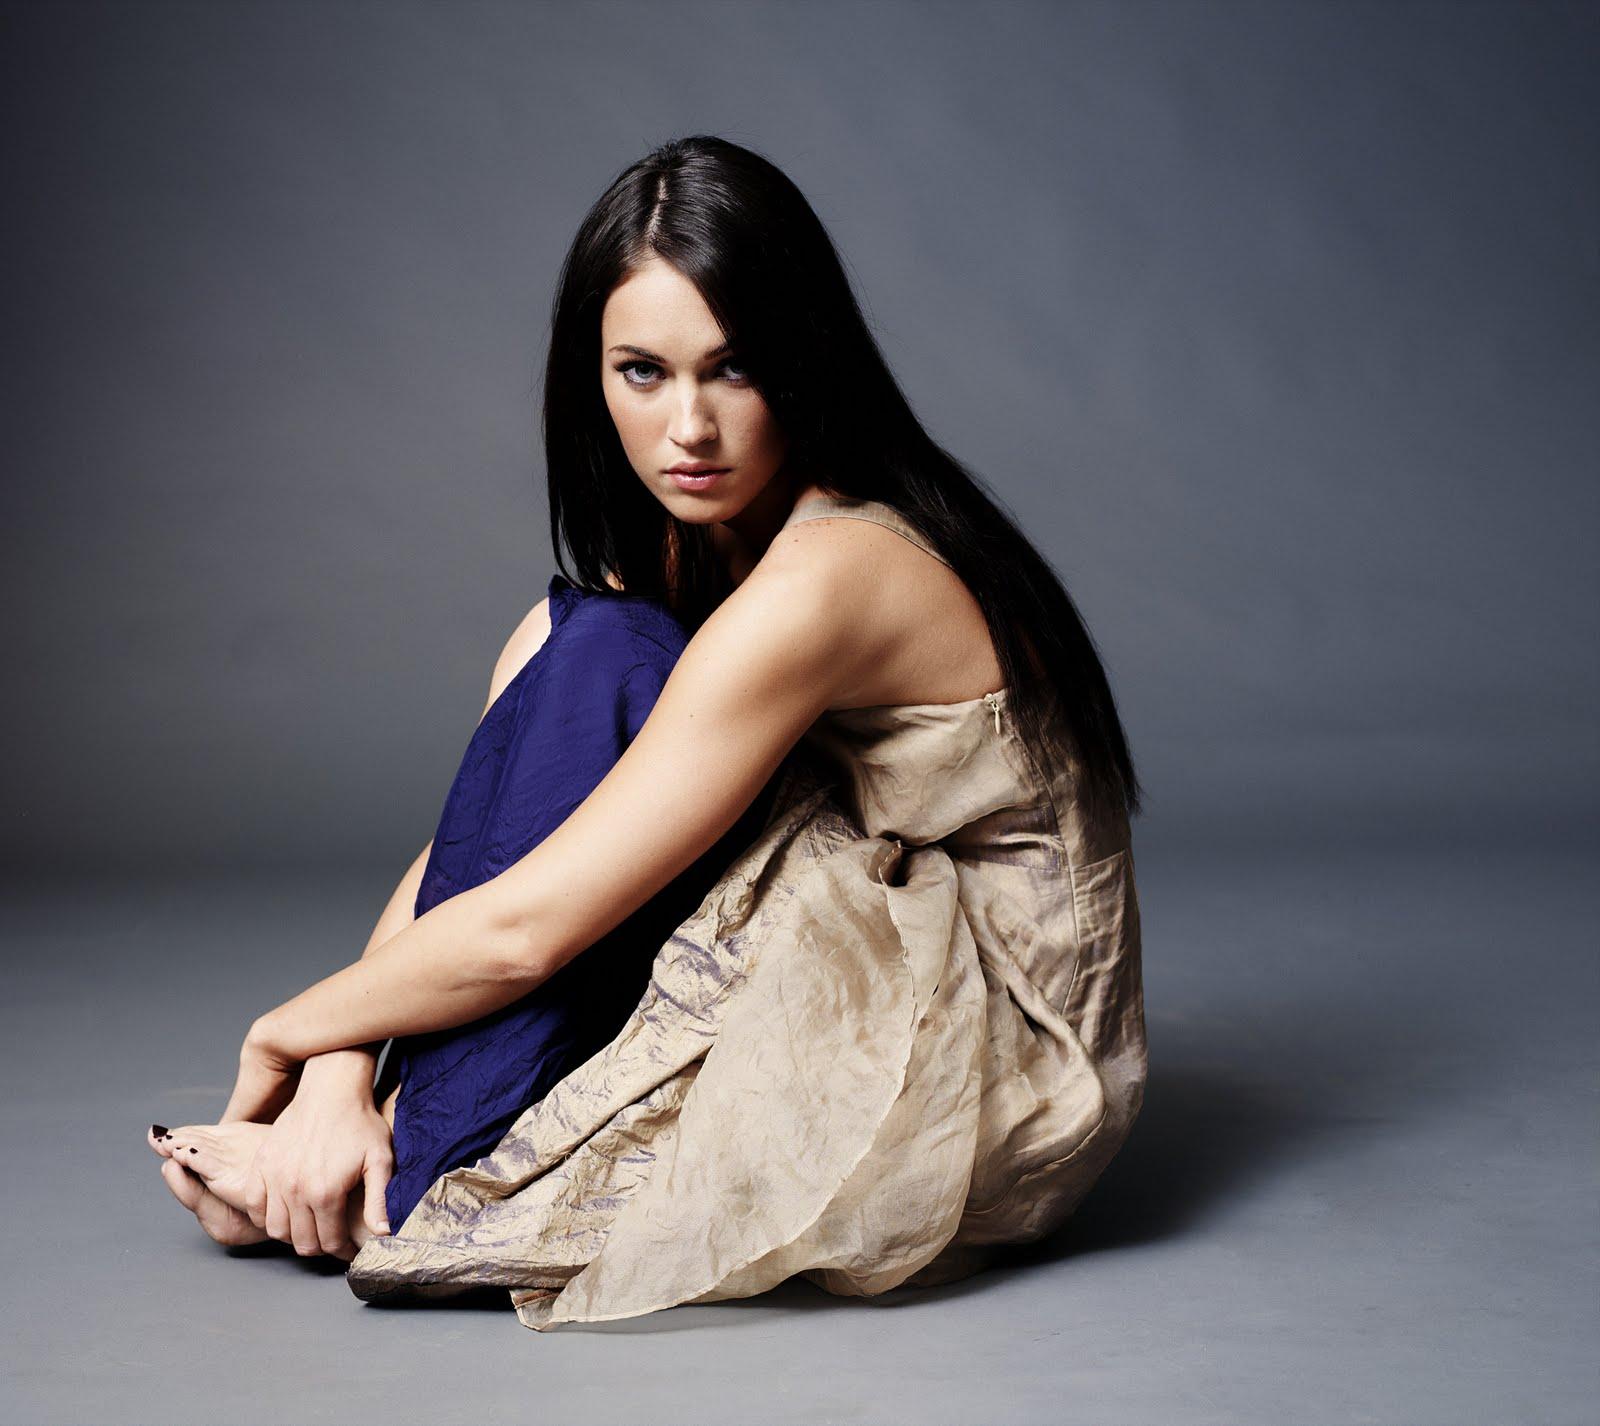 Megan Fox: Celebrity Pictures